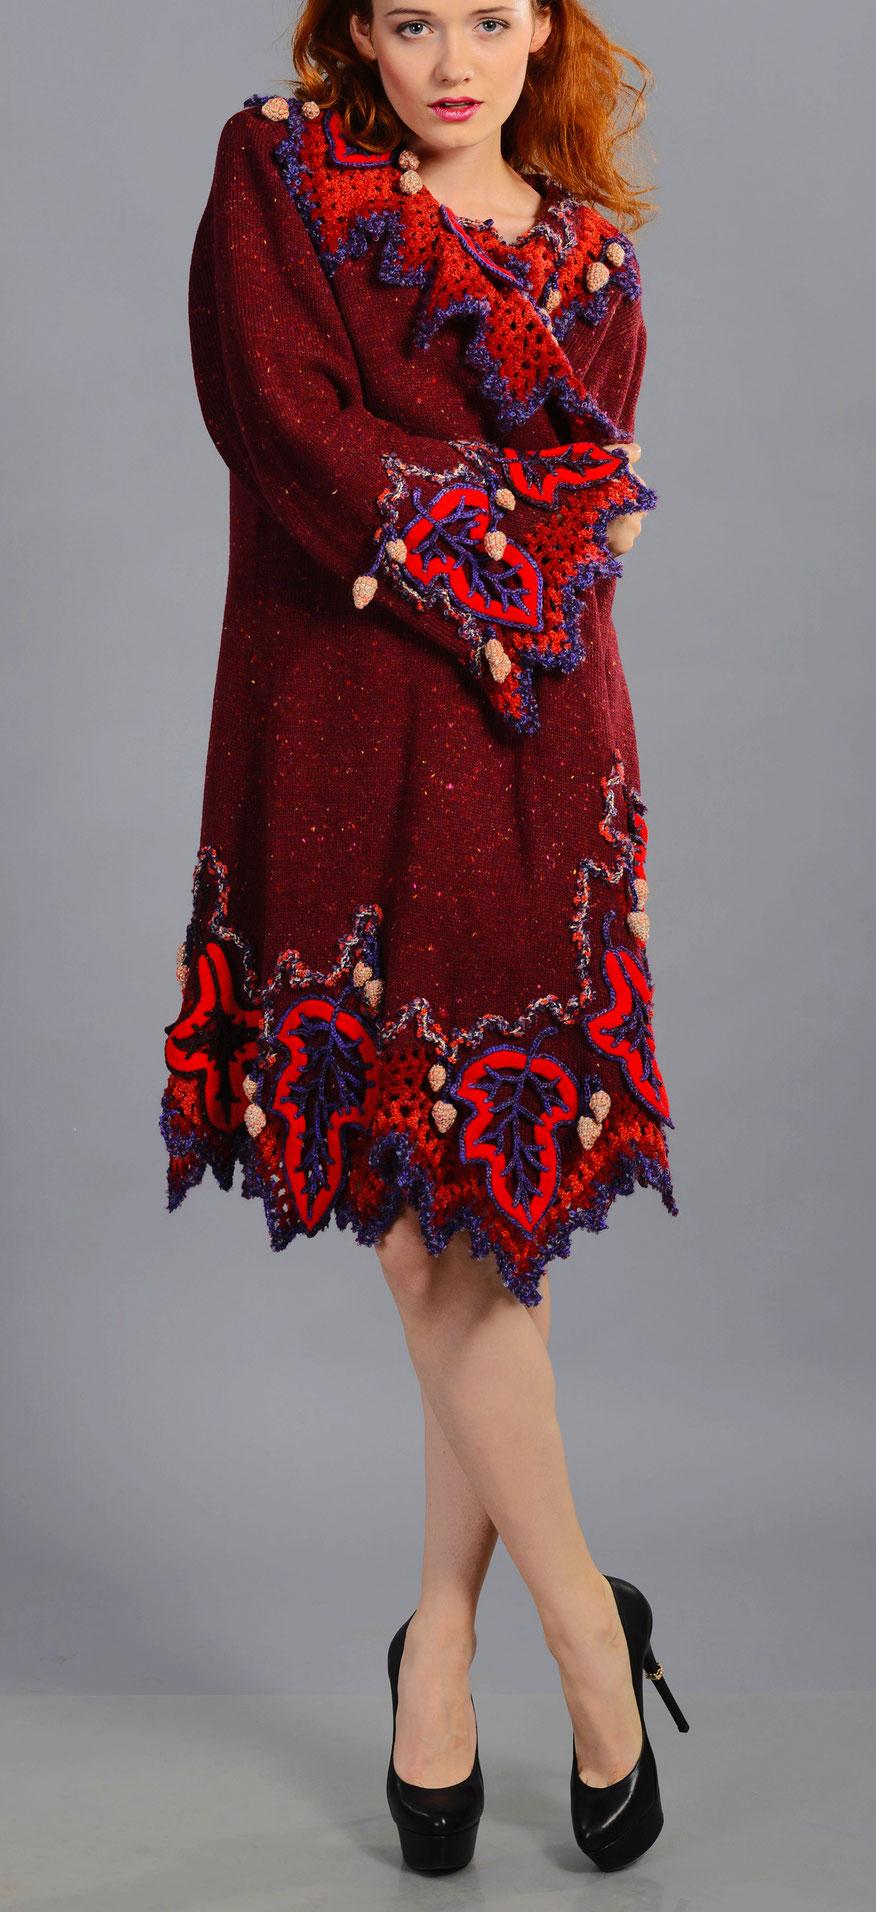 Alexander Seraphim's knitwear, 2014